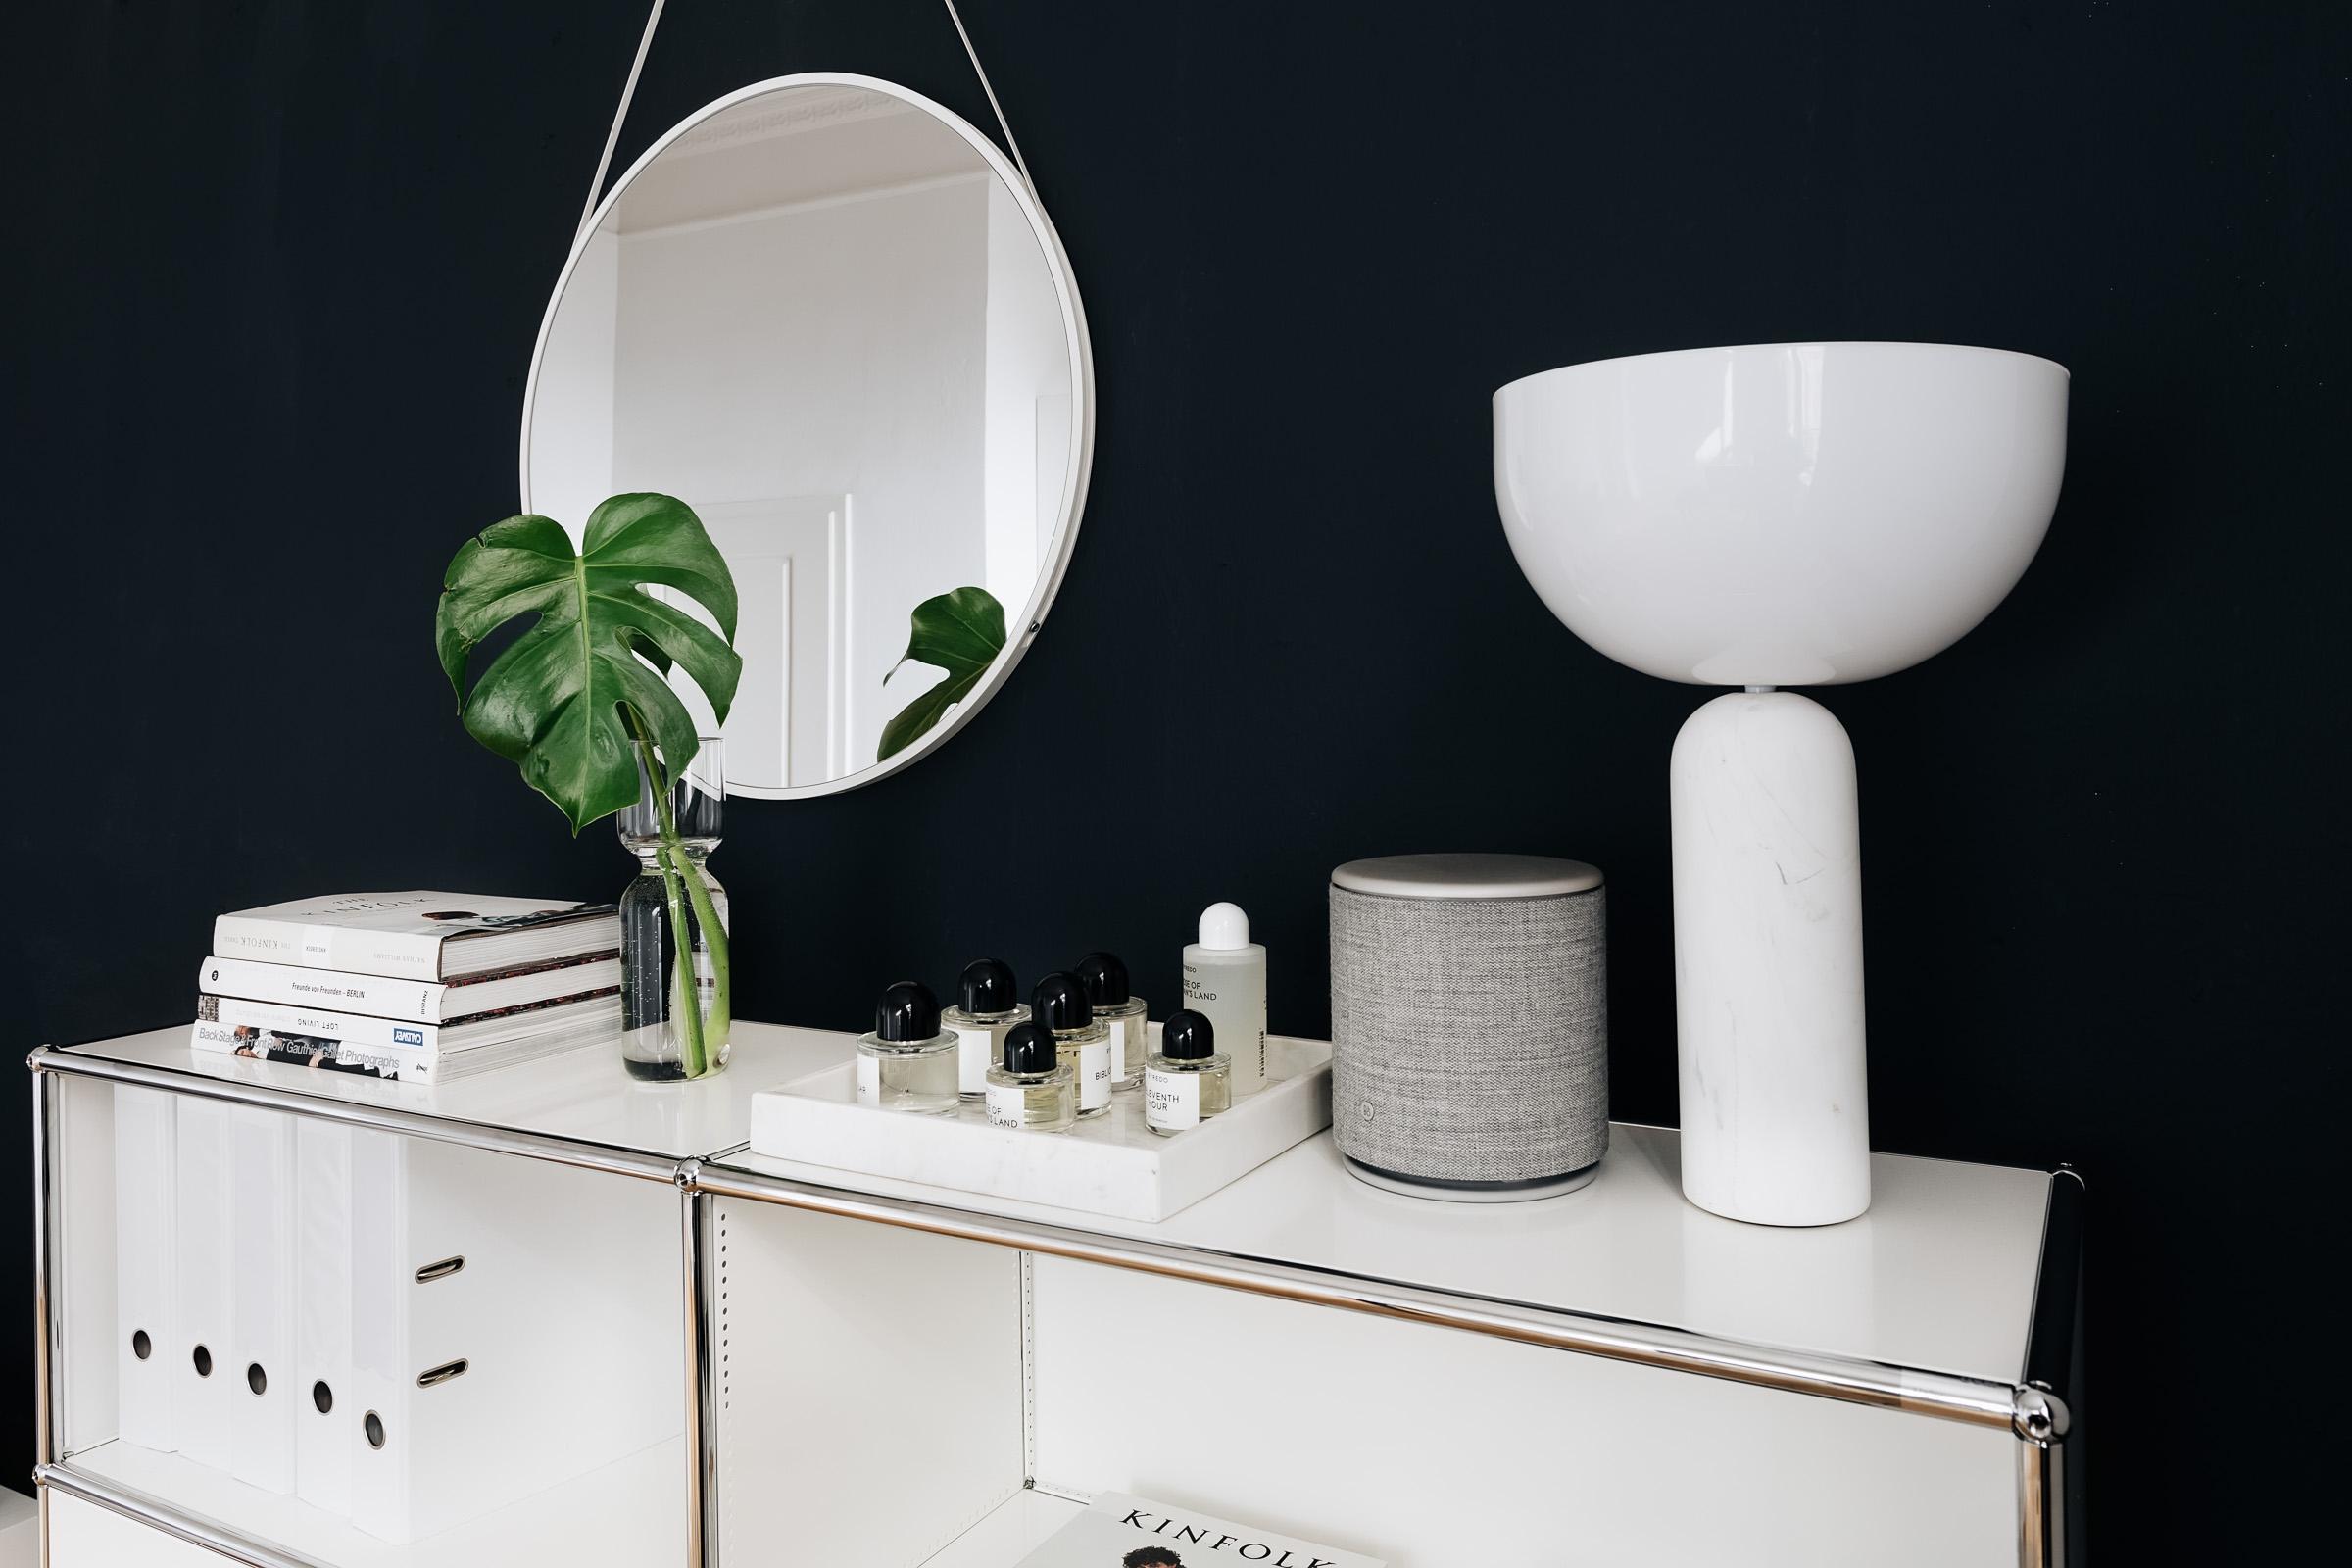 Bedroom Ambient Direct Sebastian Schmidt by Rose Time